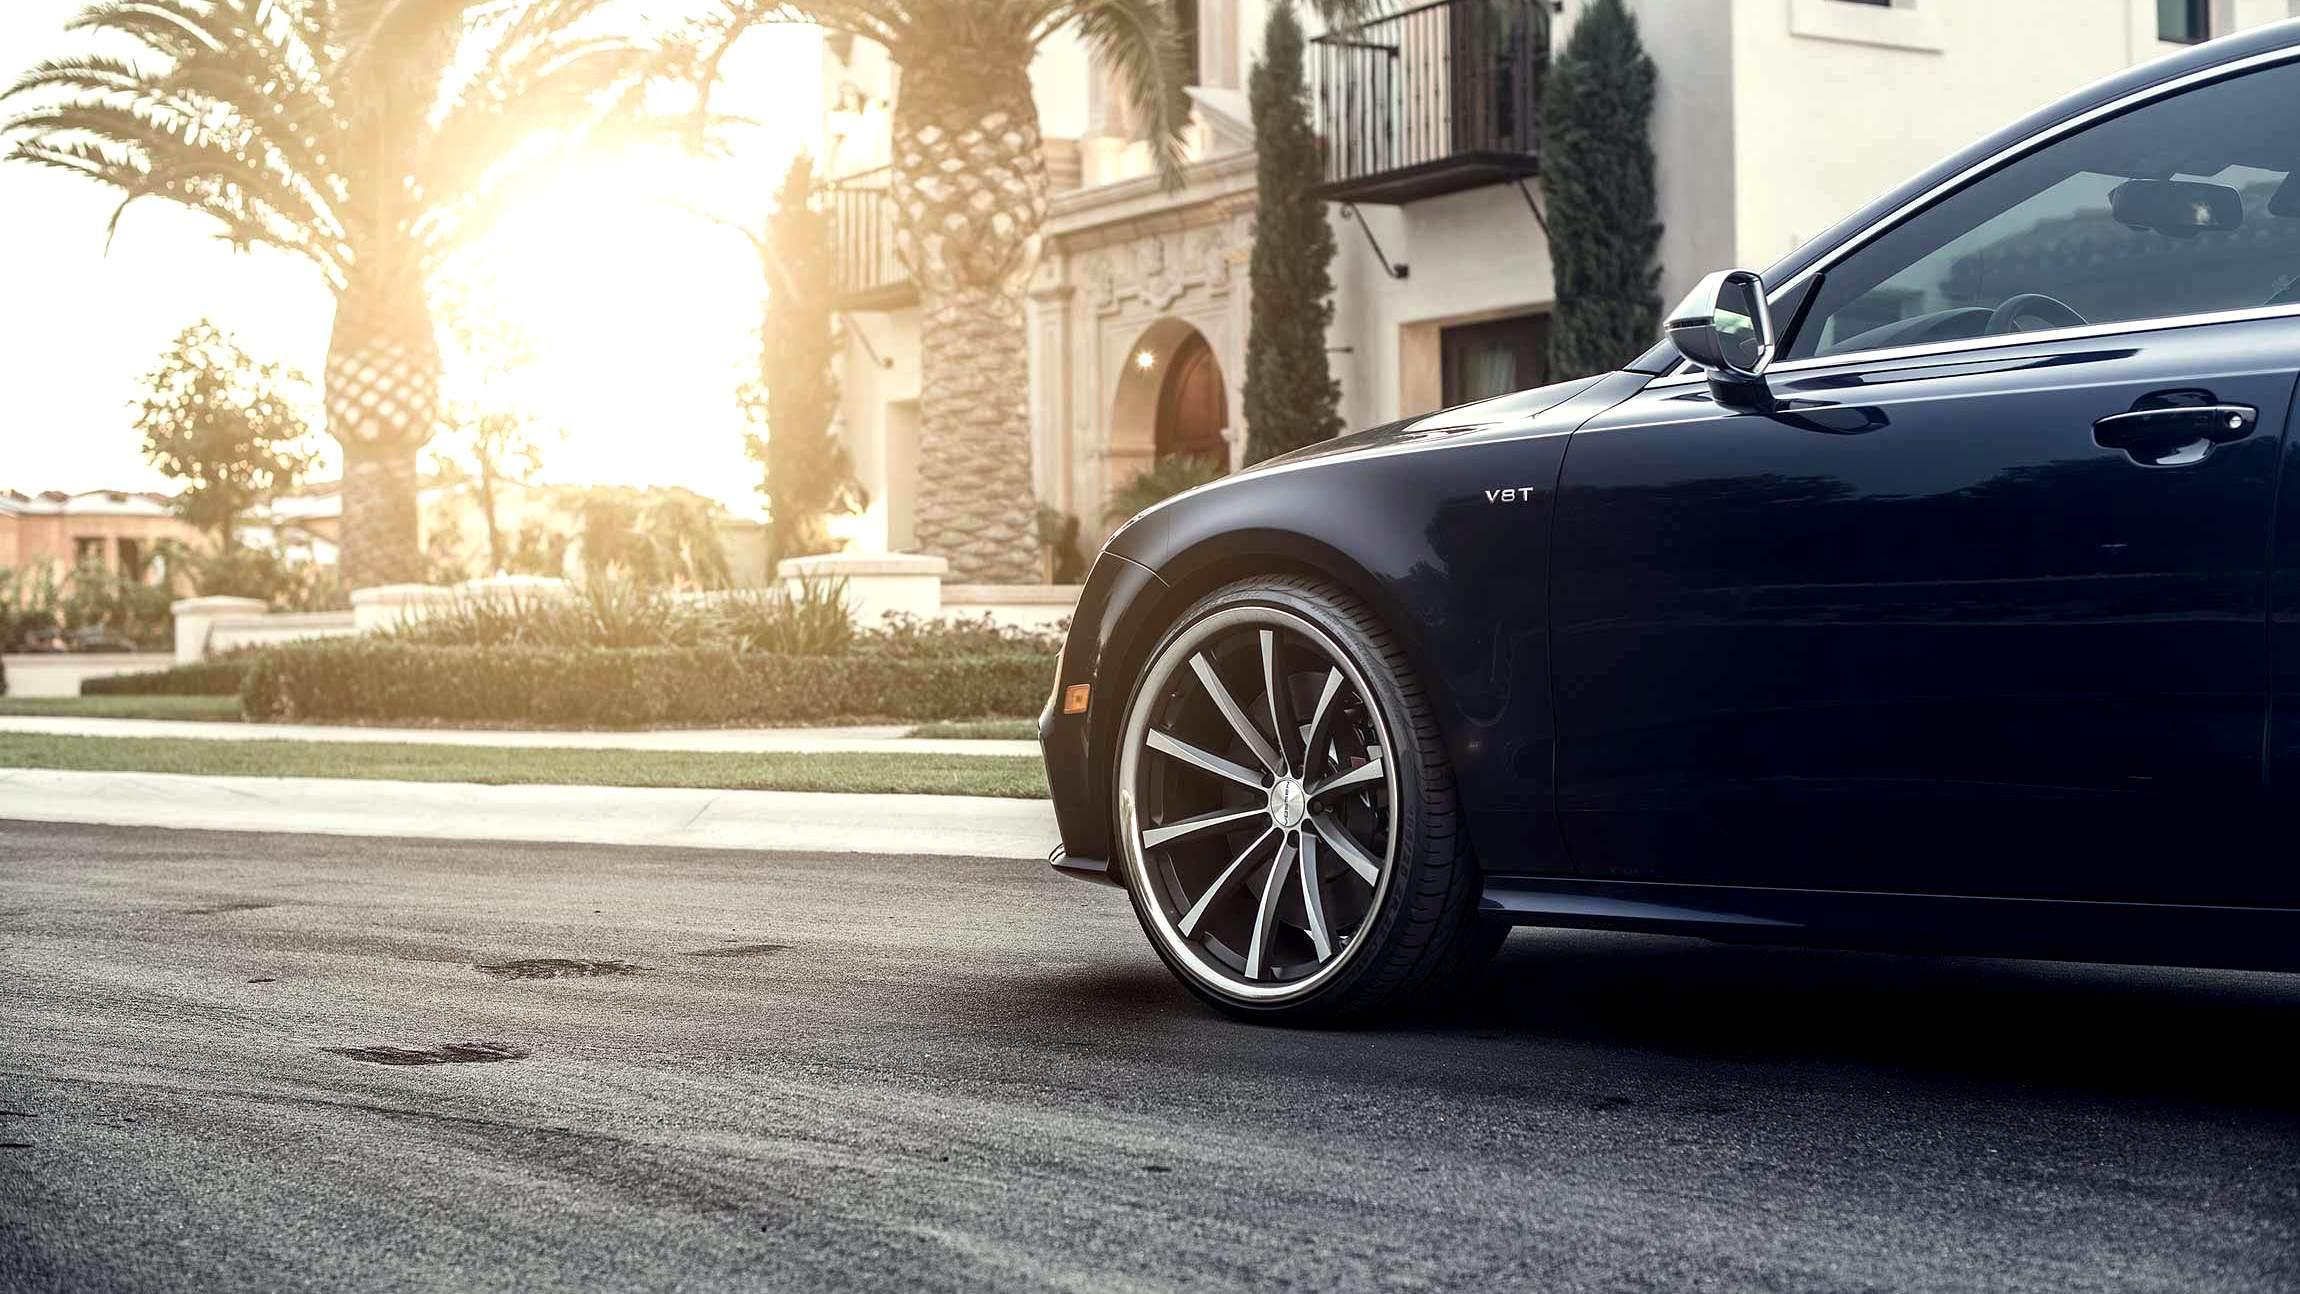 Audi A7 Hd Wallpaper Background Image 2300x1294 Id447470